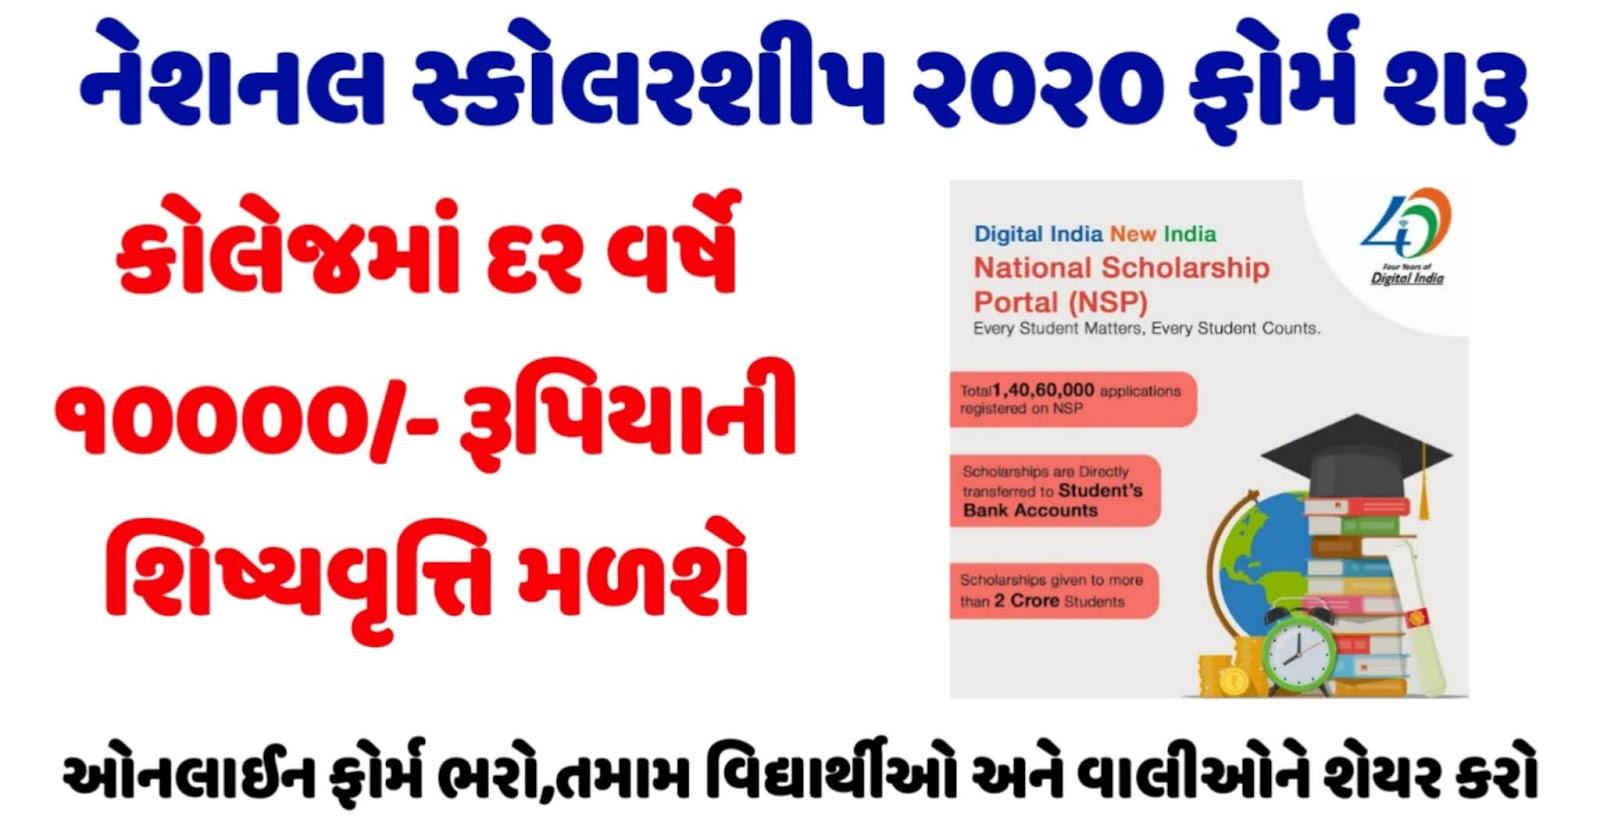 National Scholarship Portal (NSP) Apply Online 2020@scholarships.gov.in